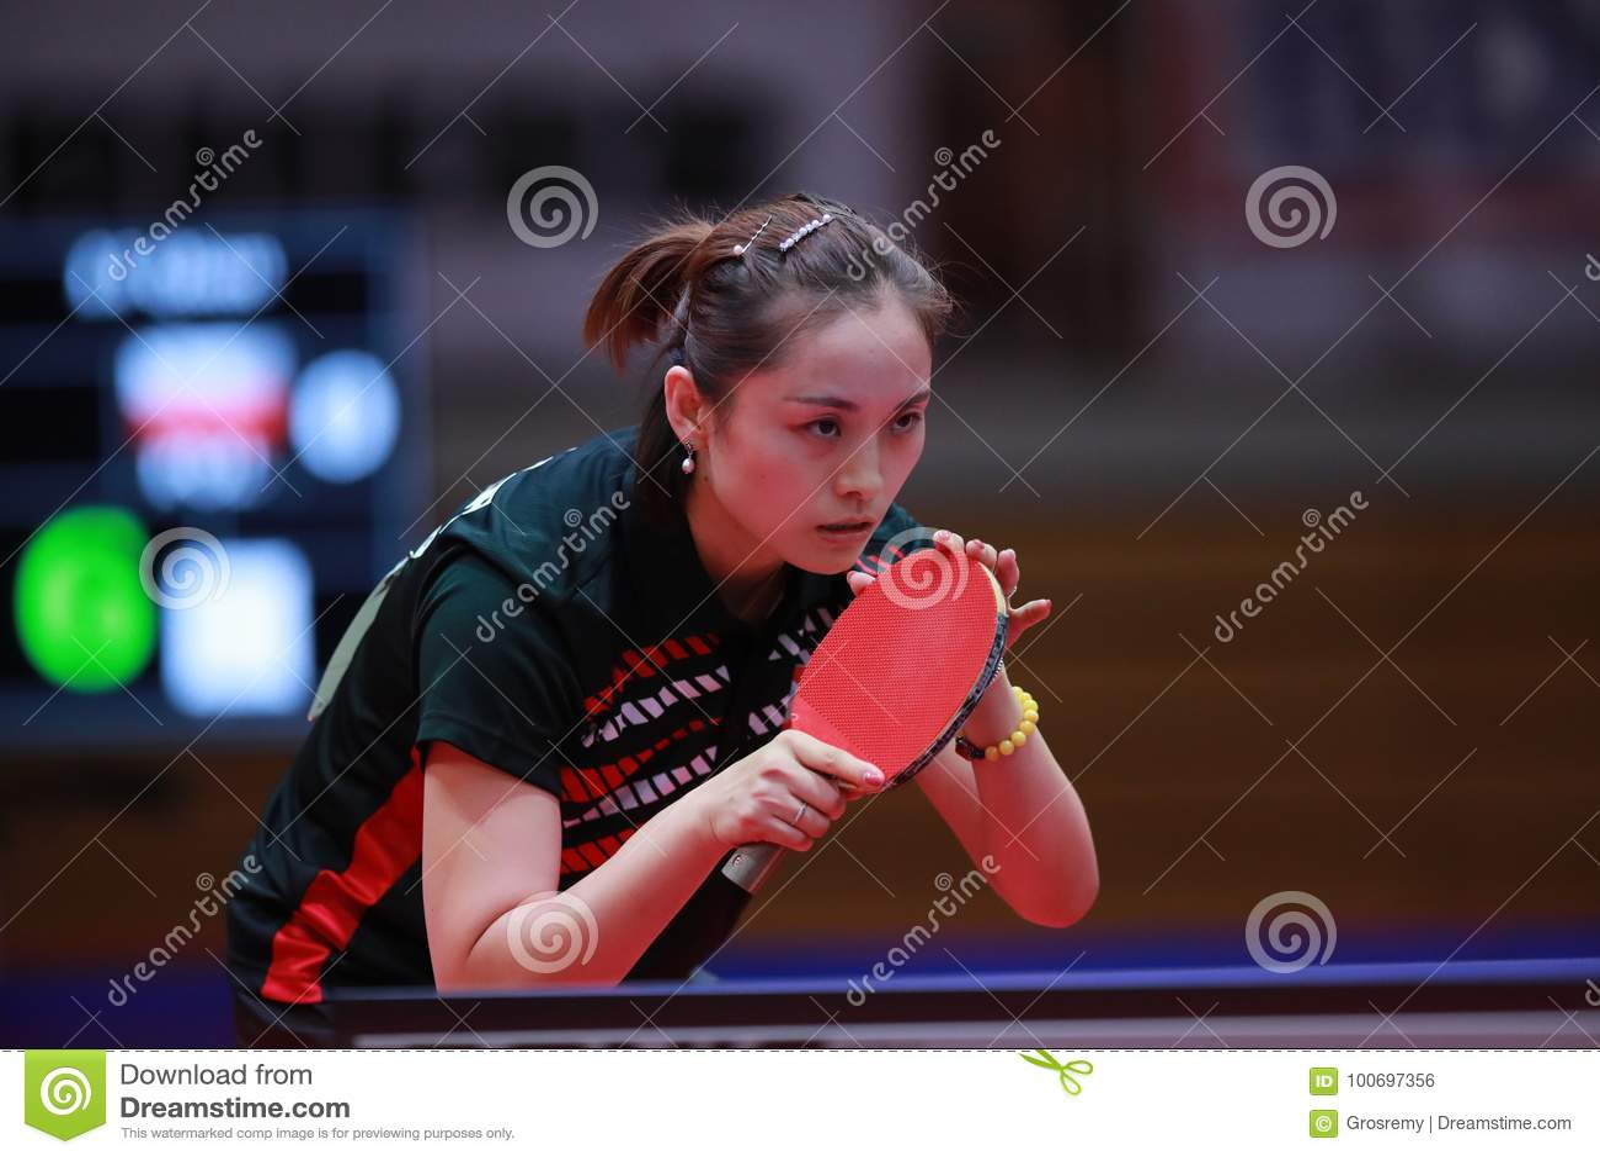 pictures Li Qian